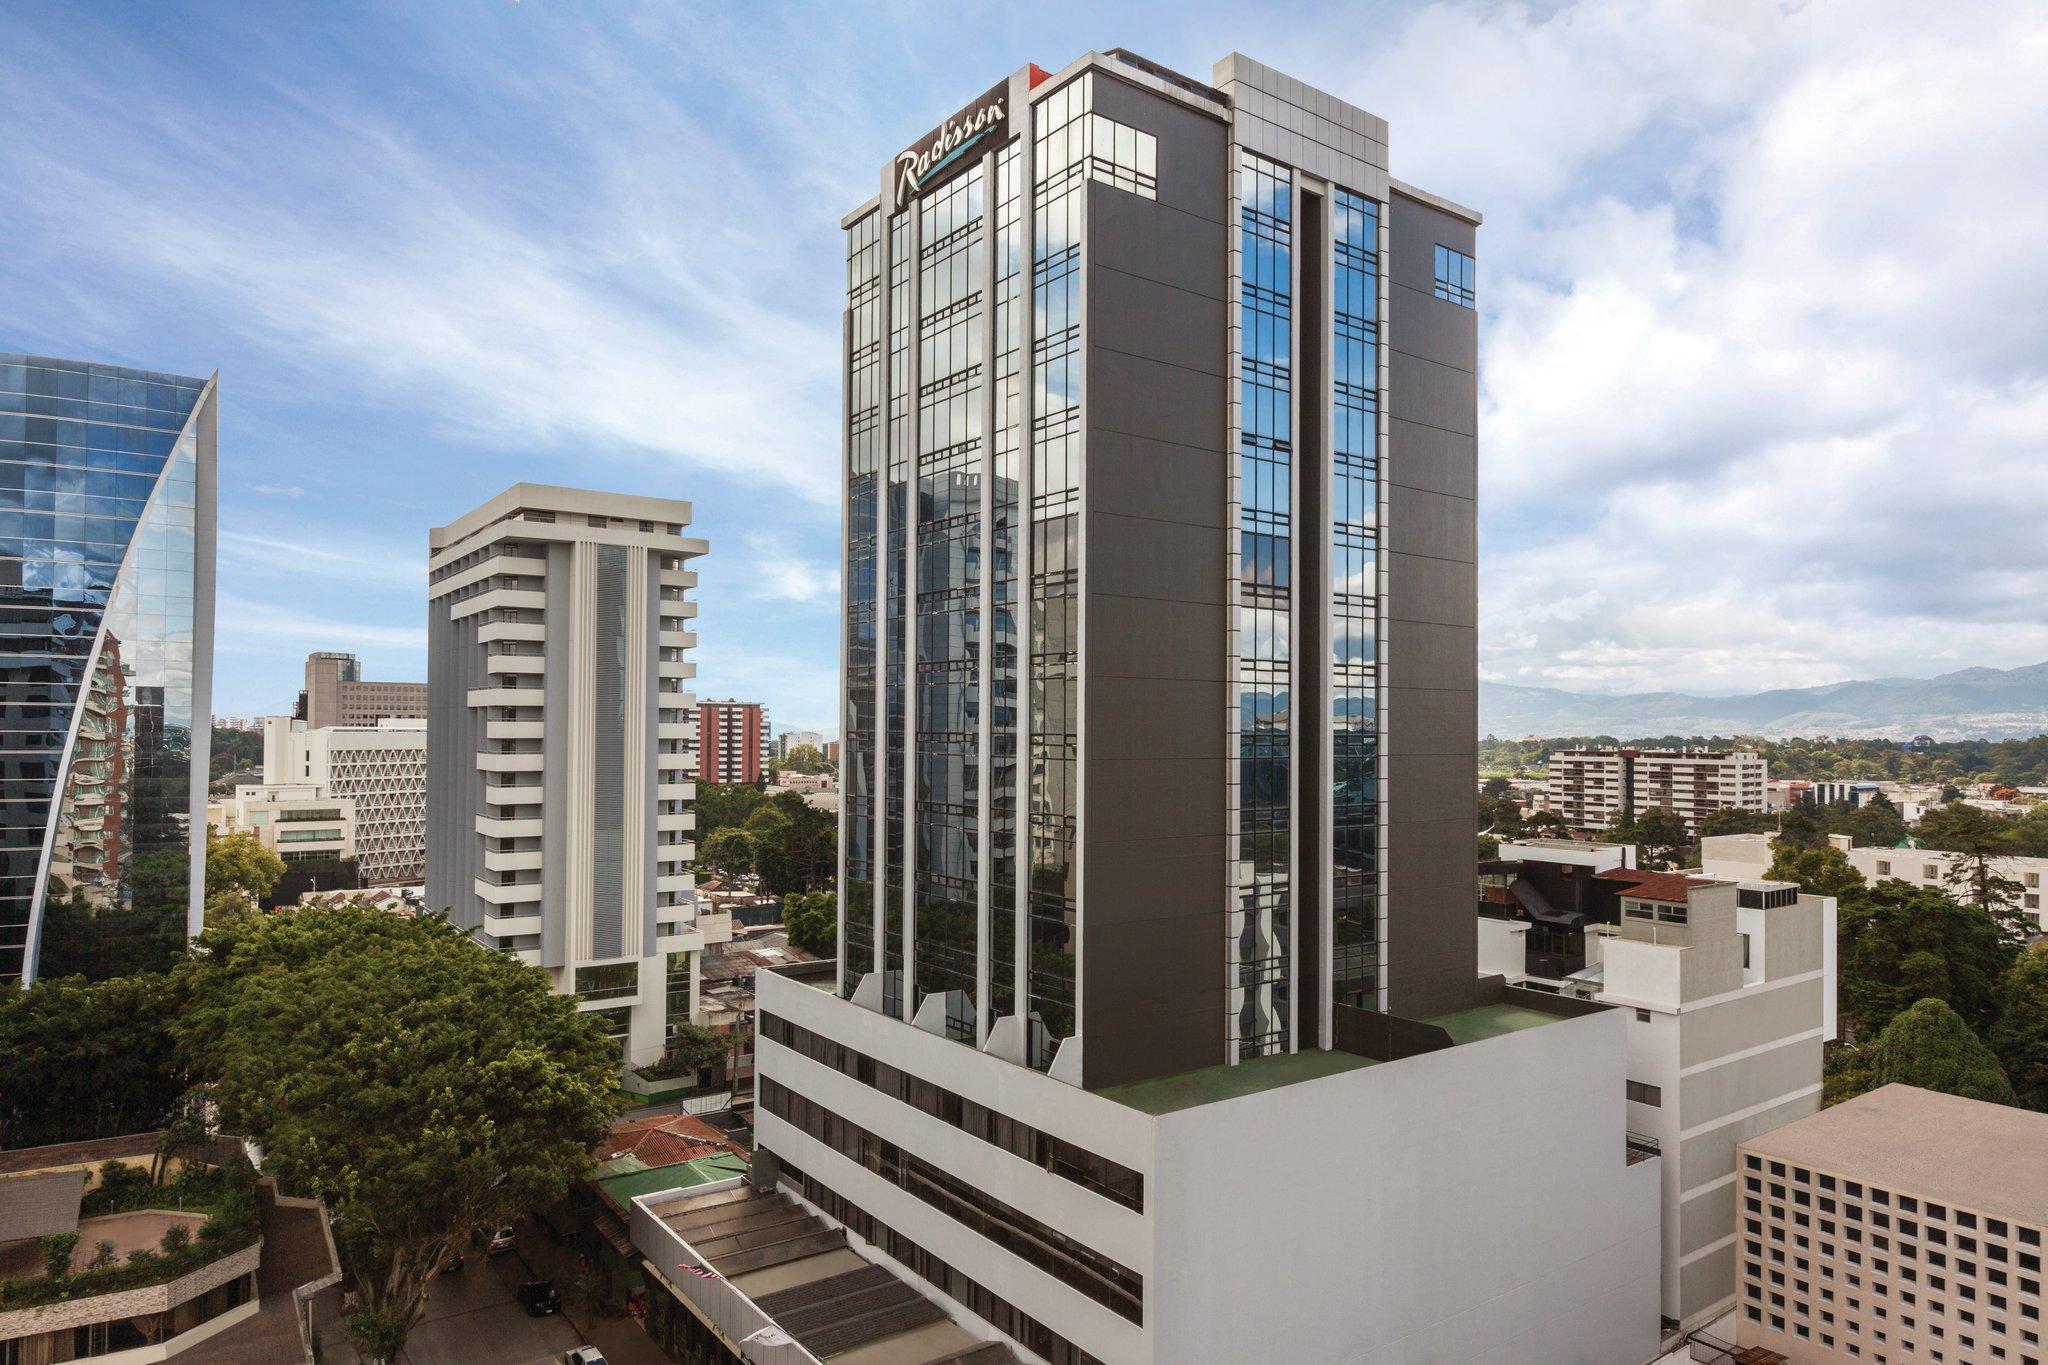 Radisson Hotel And Suites Guatemala City, ZONA 10